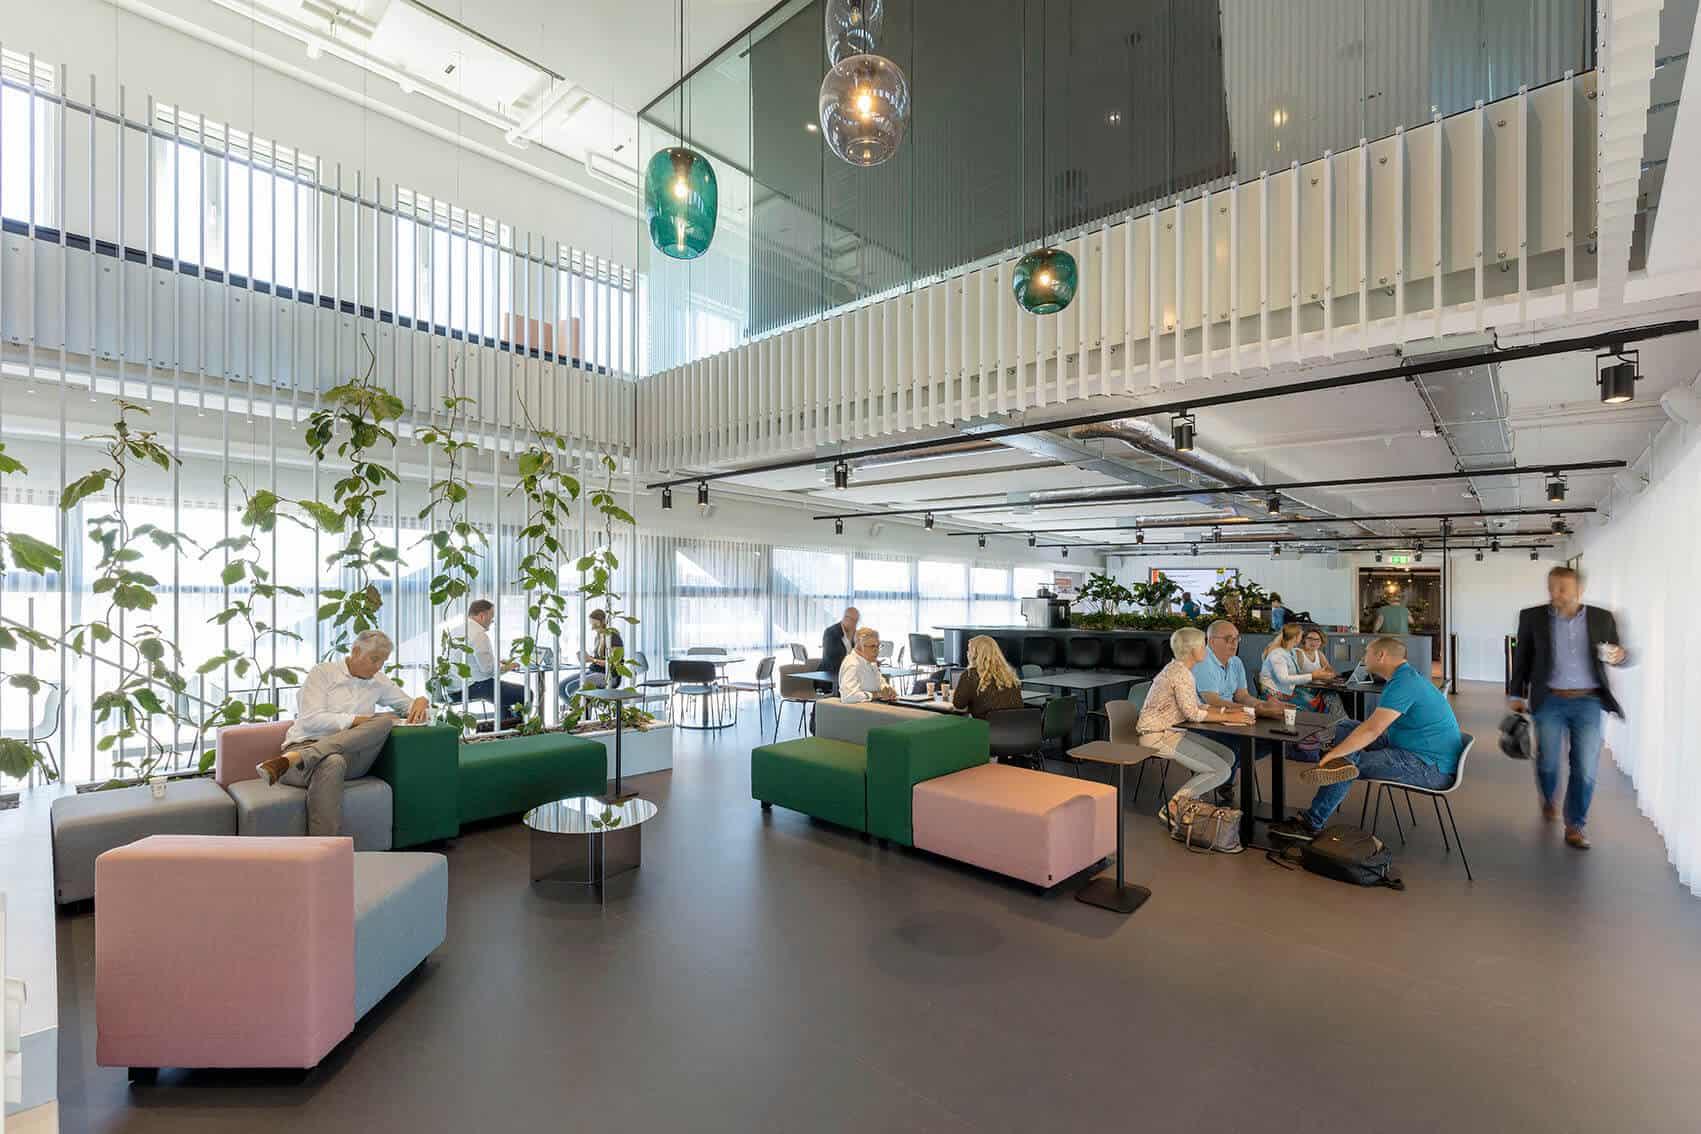 Interieur-hal-Stadskantoor-Alkmaar-copyright-Marcel-van-der-Burg-1